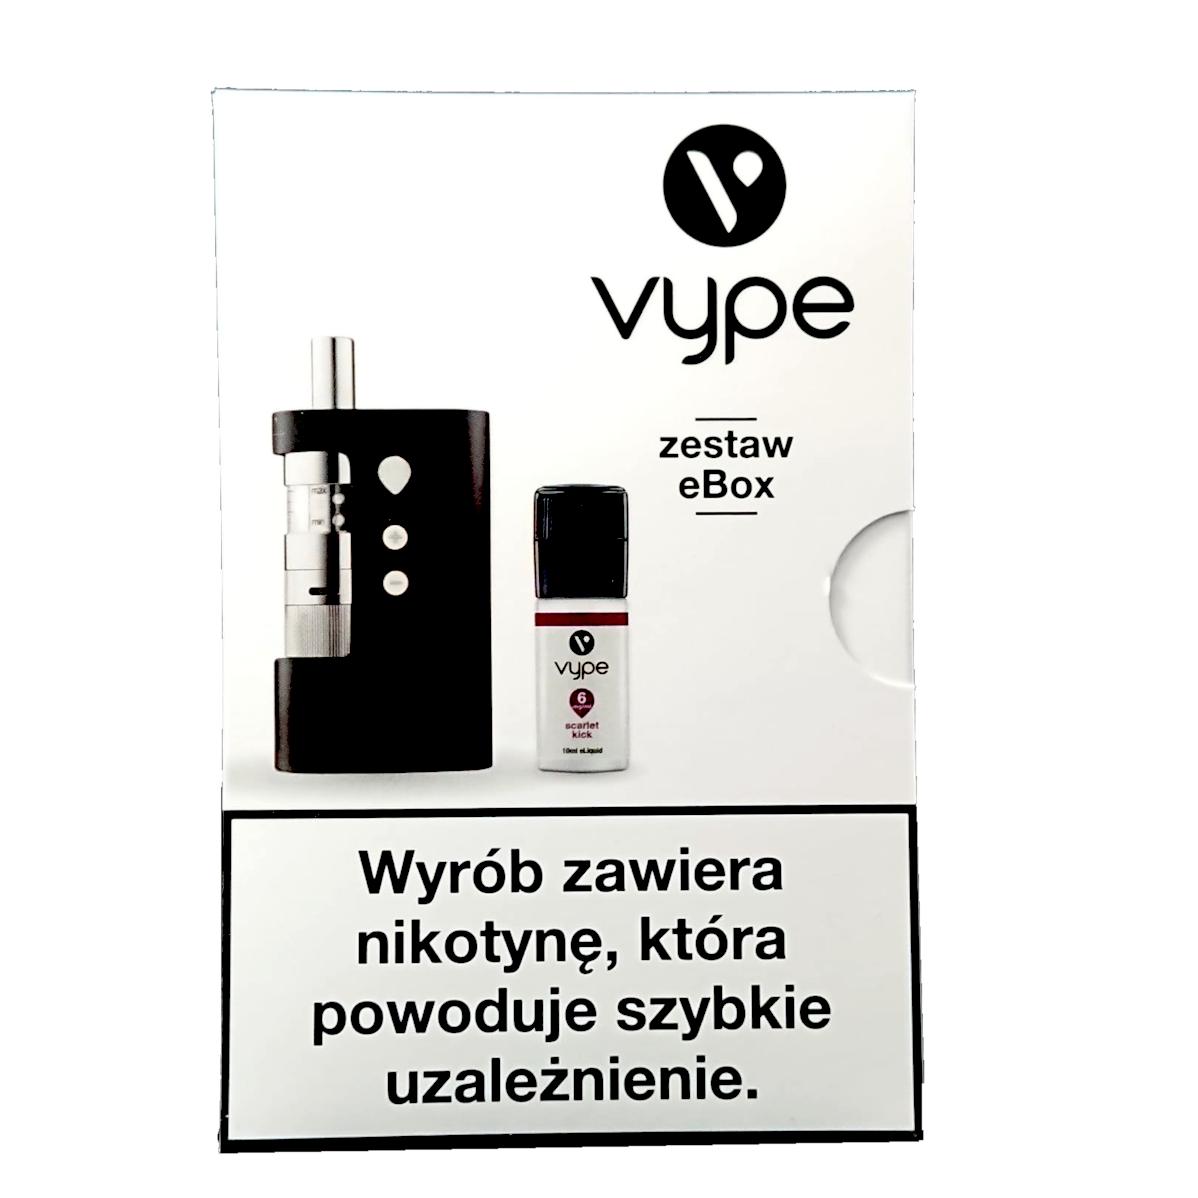 Papierosy Elektroniczne - Vype eBox Starter Kit + Scarlet Kick 6mg/ml TPD